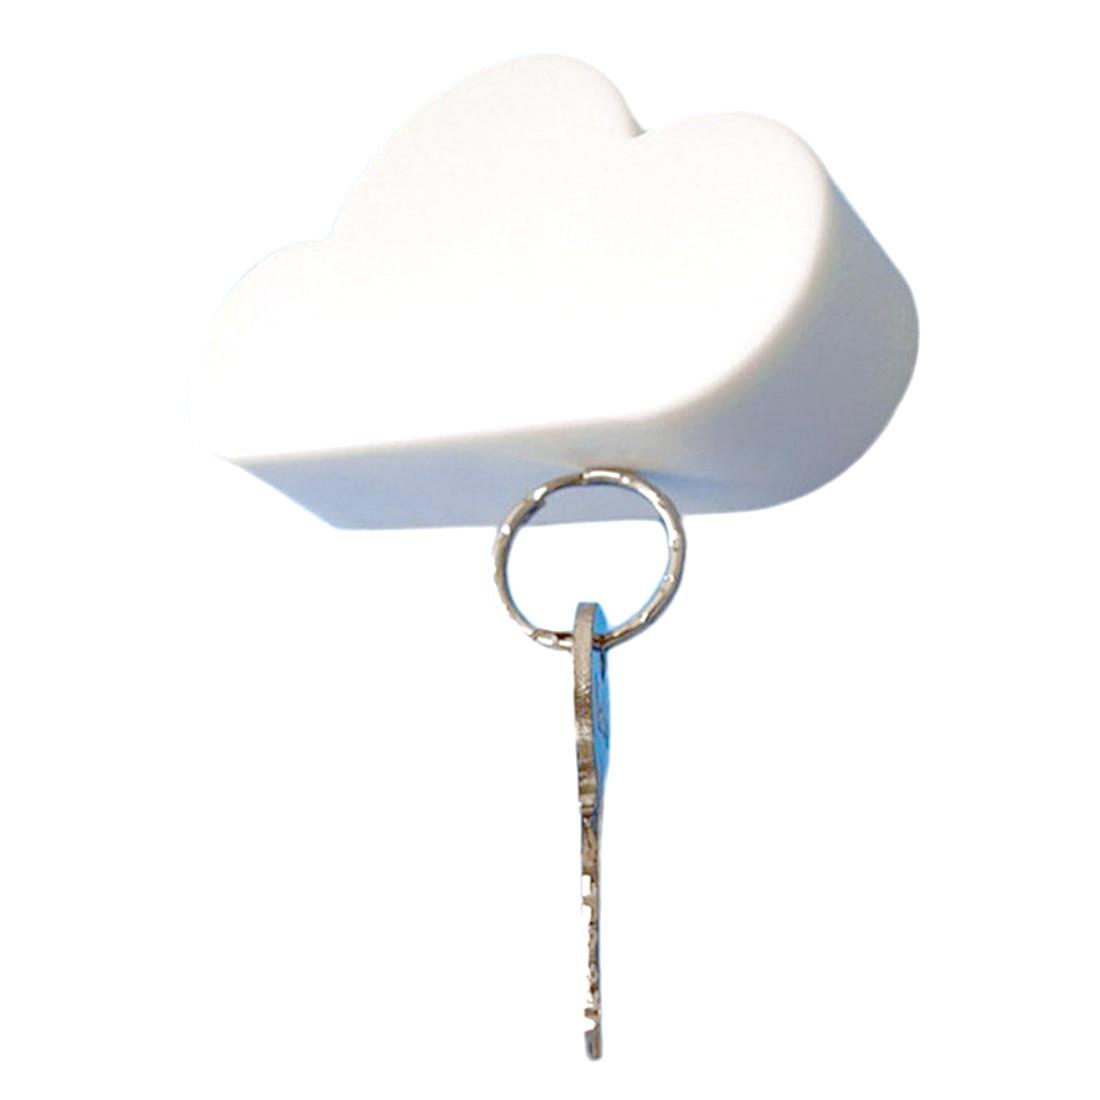 Creative 1PC White Cloud Shape Key Holder Creative Home Storage Holder Hanger Magnetic Magnet Keychain Holder Wall Decor Gift